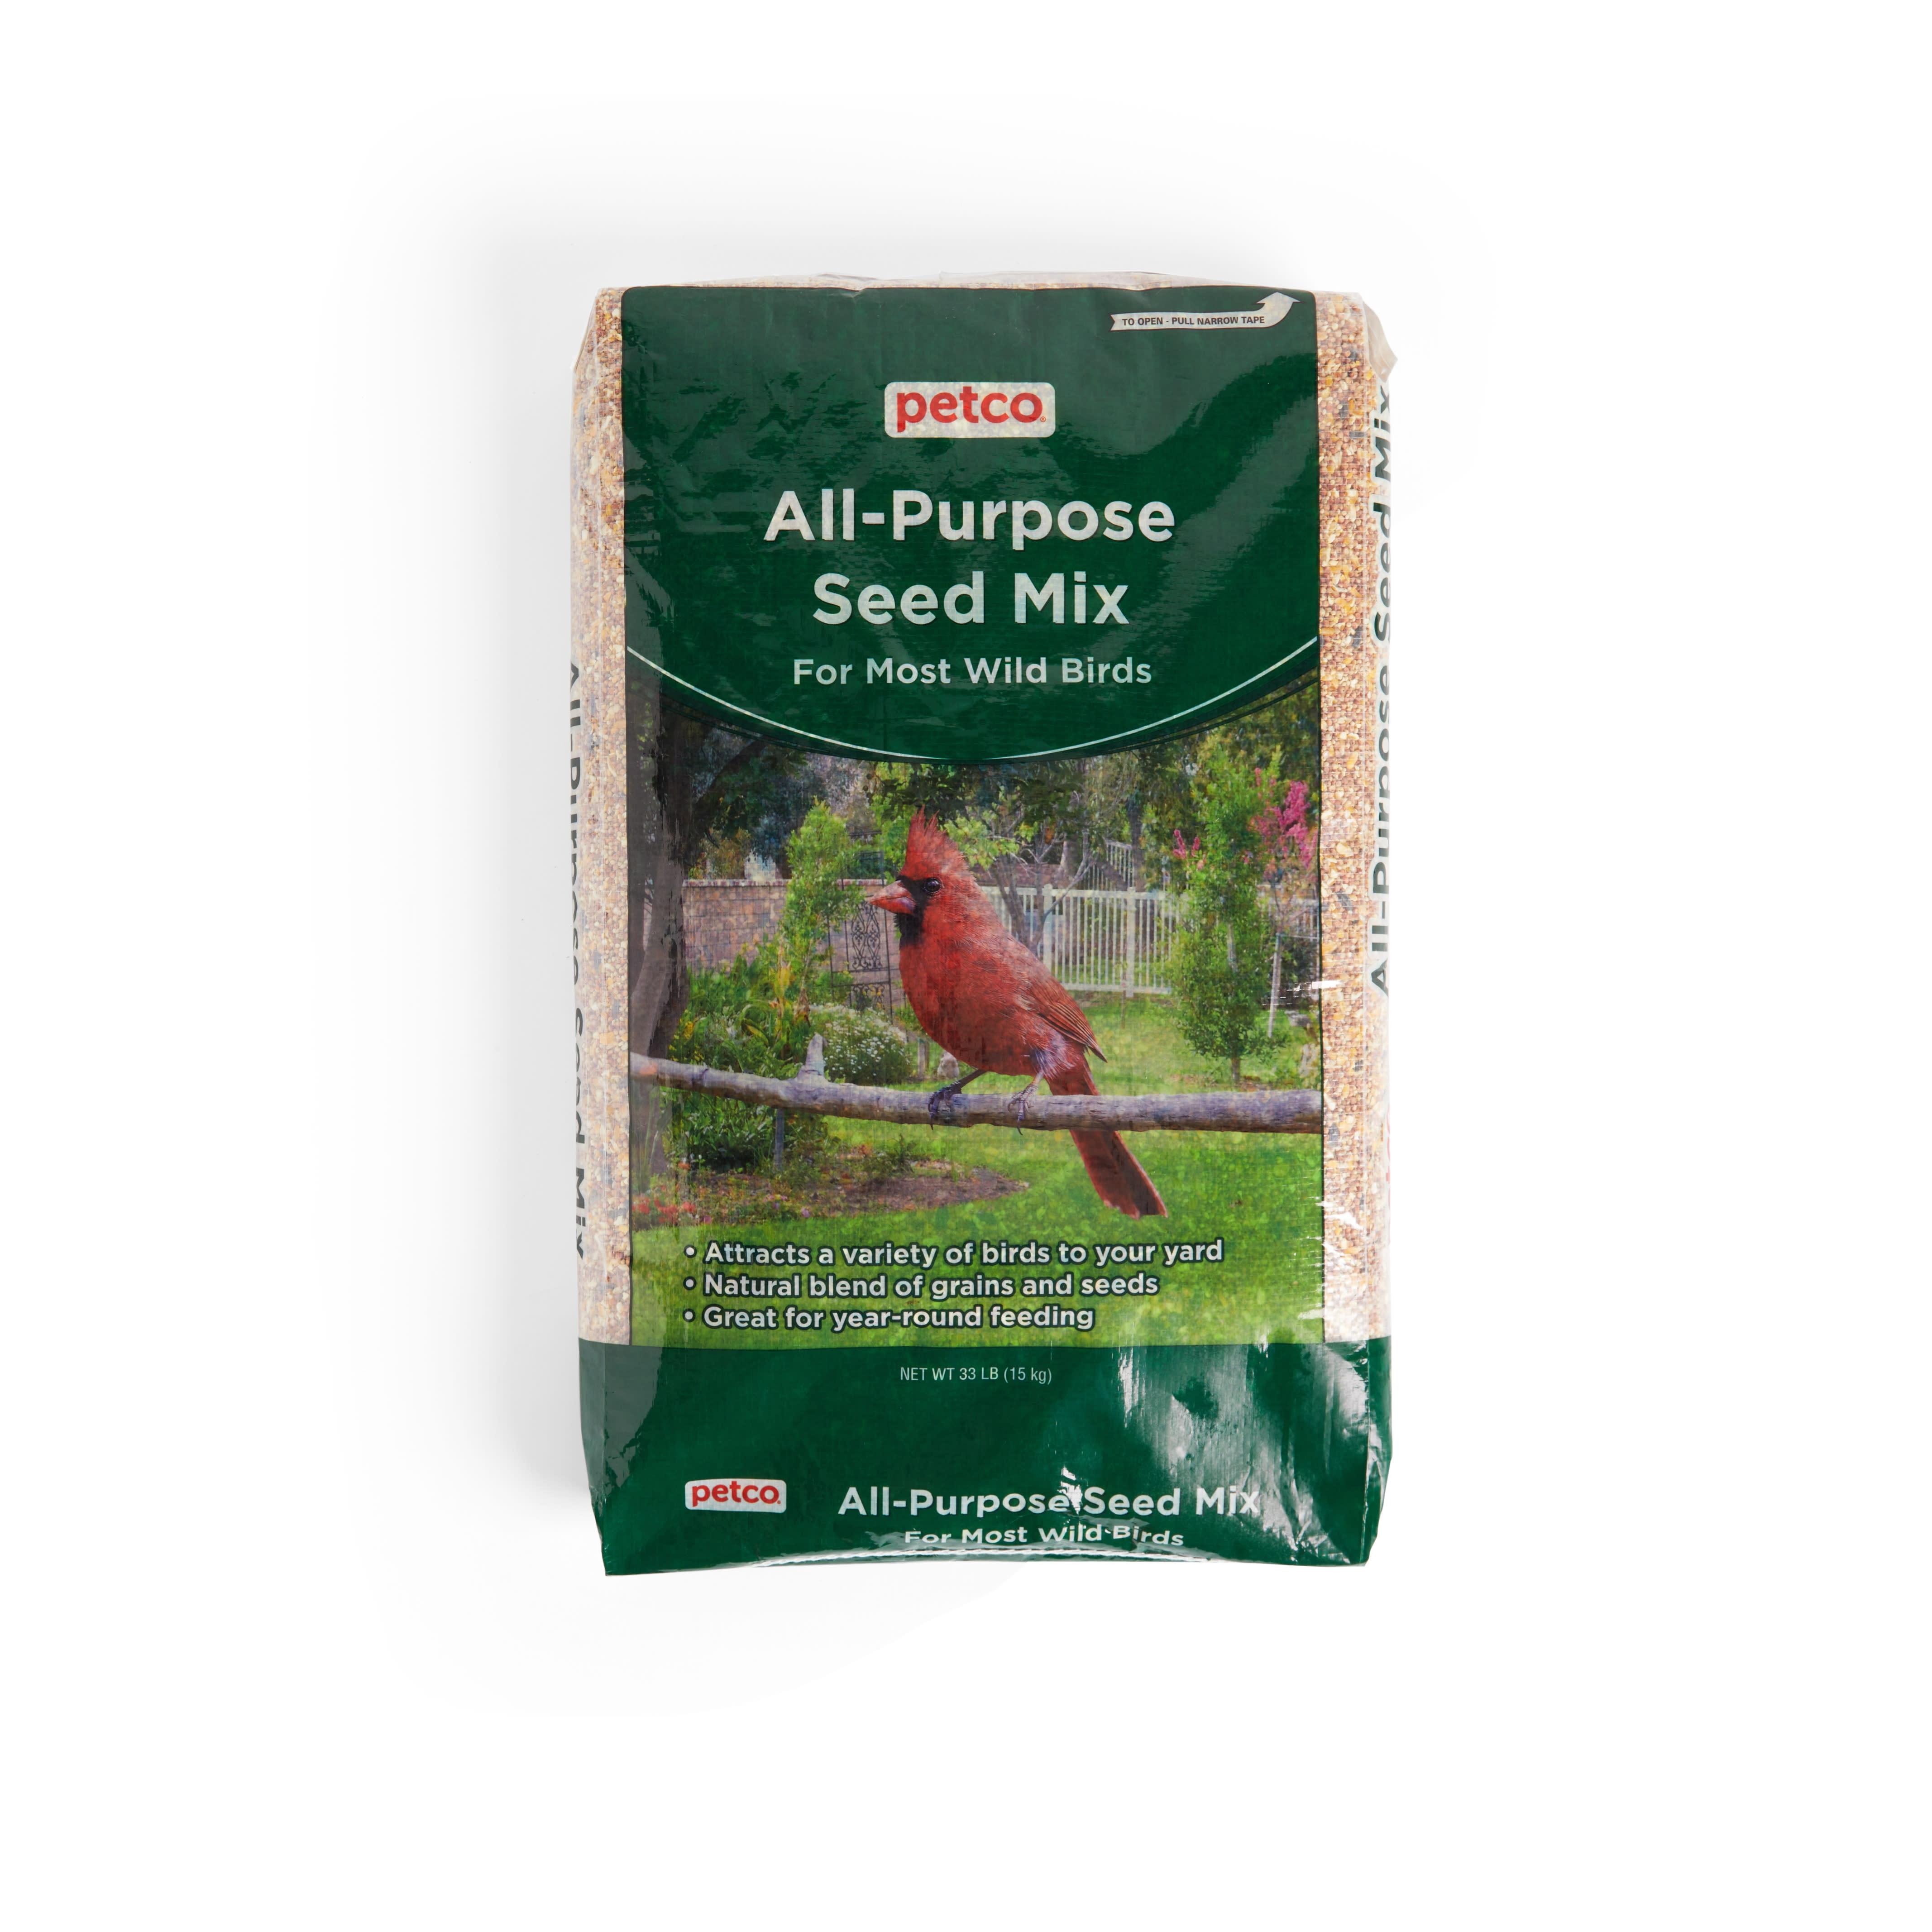 Wild Bird Seed Feeder And Seed Mix